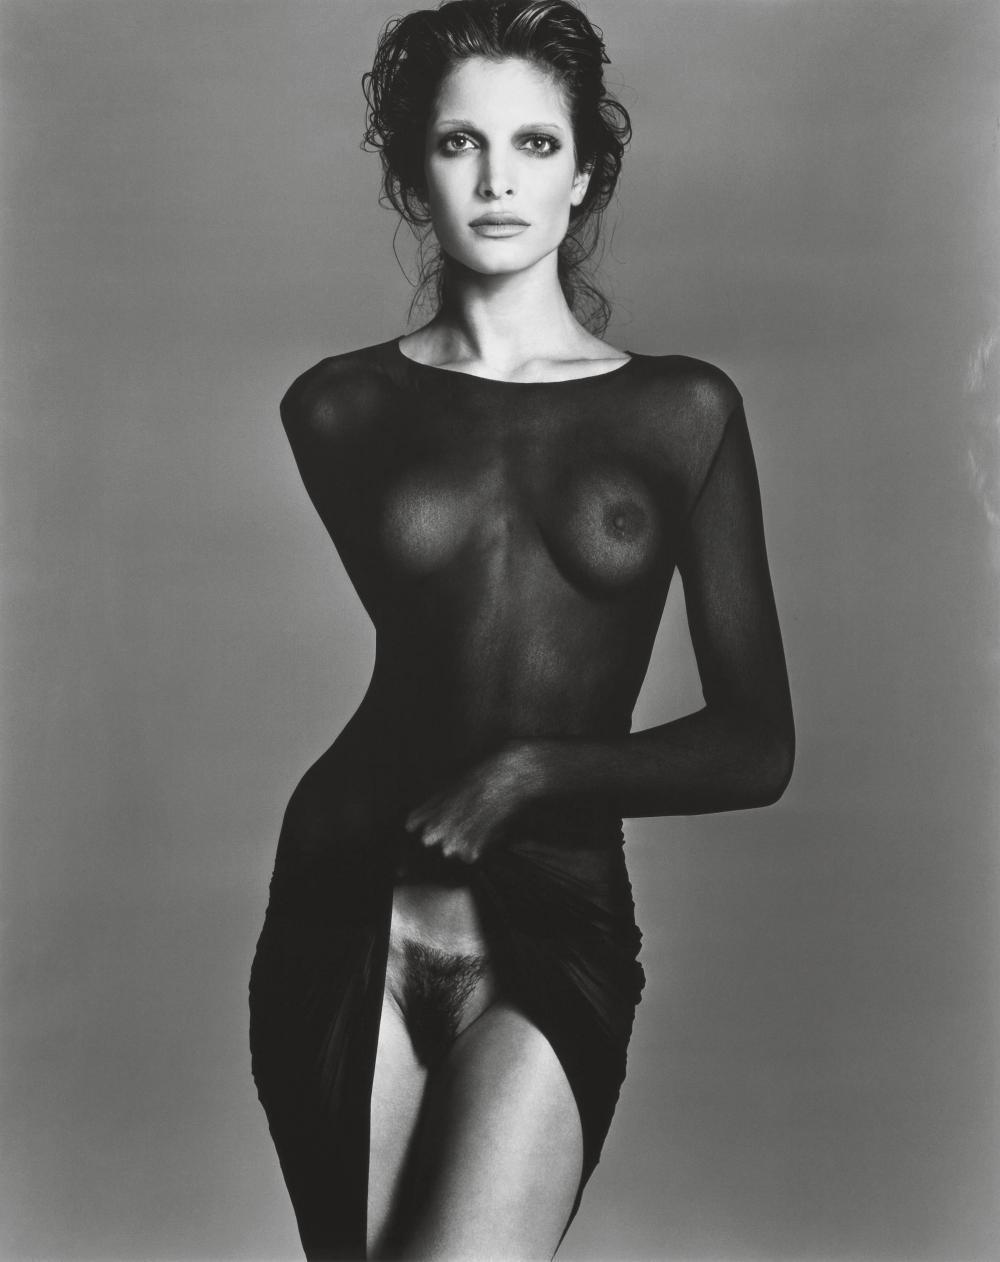 RICHARD AVEDON - STEPHANIE SEYMOUR, NY - 1992